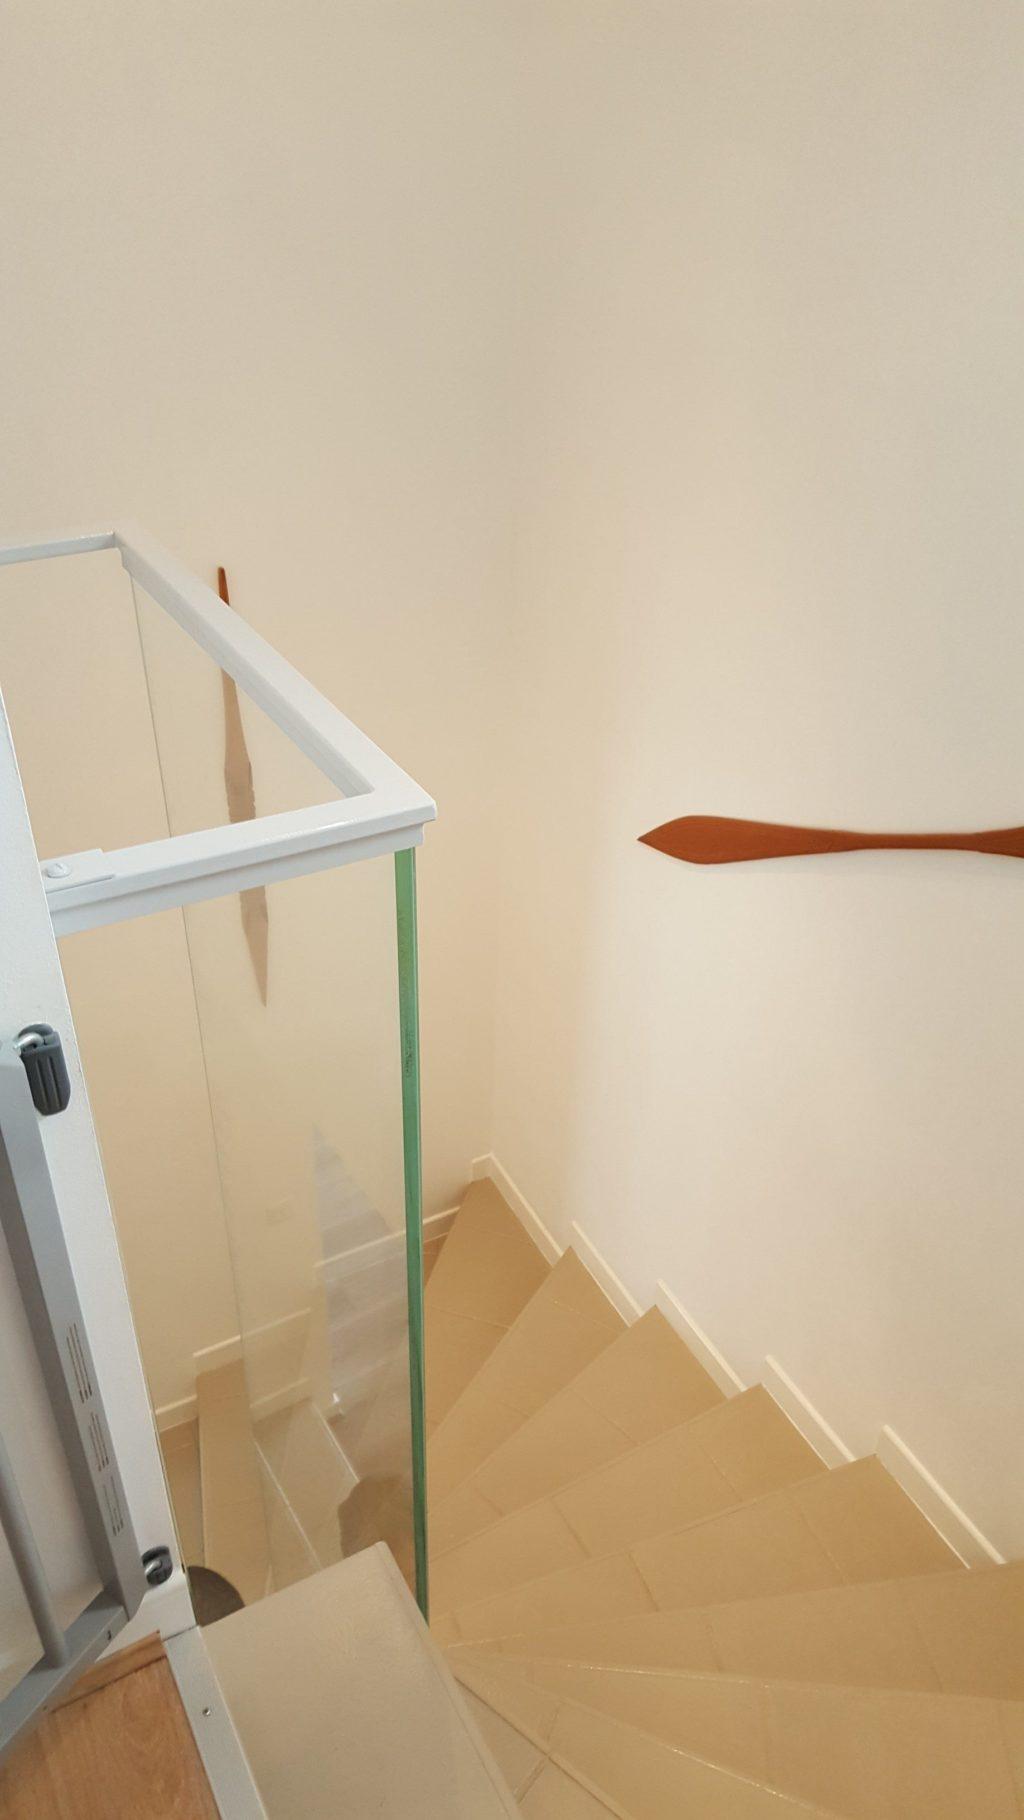 garde corps en verre langlade gard 30 fmg metal studio. Black Bedroom Furniture Sets. Home Design Ideas